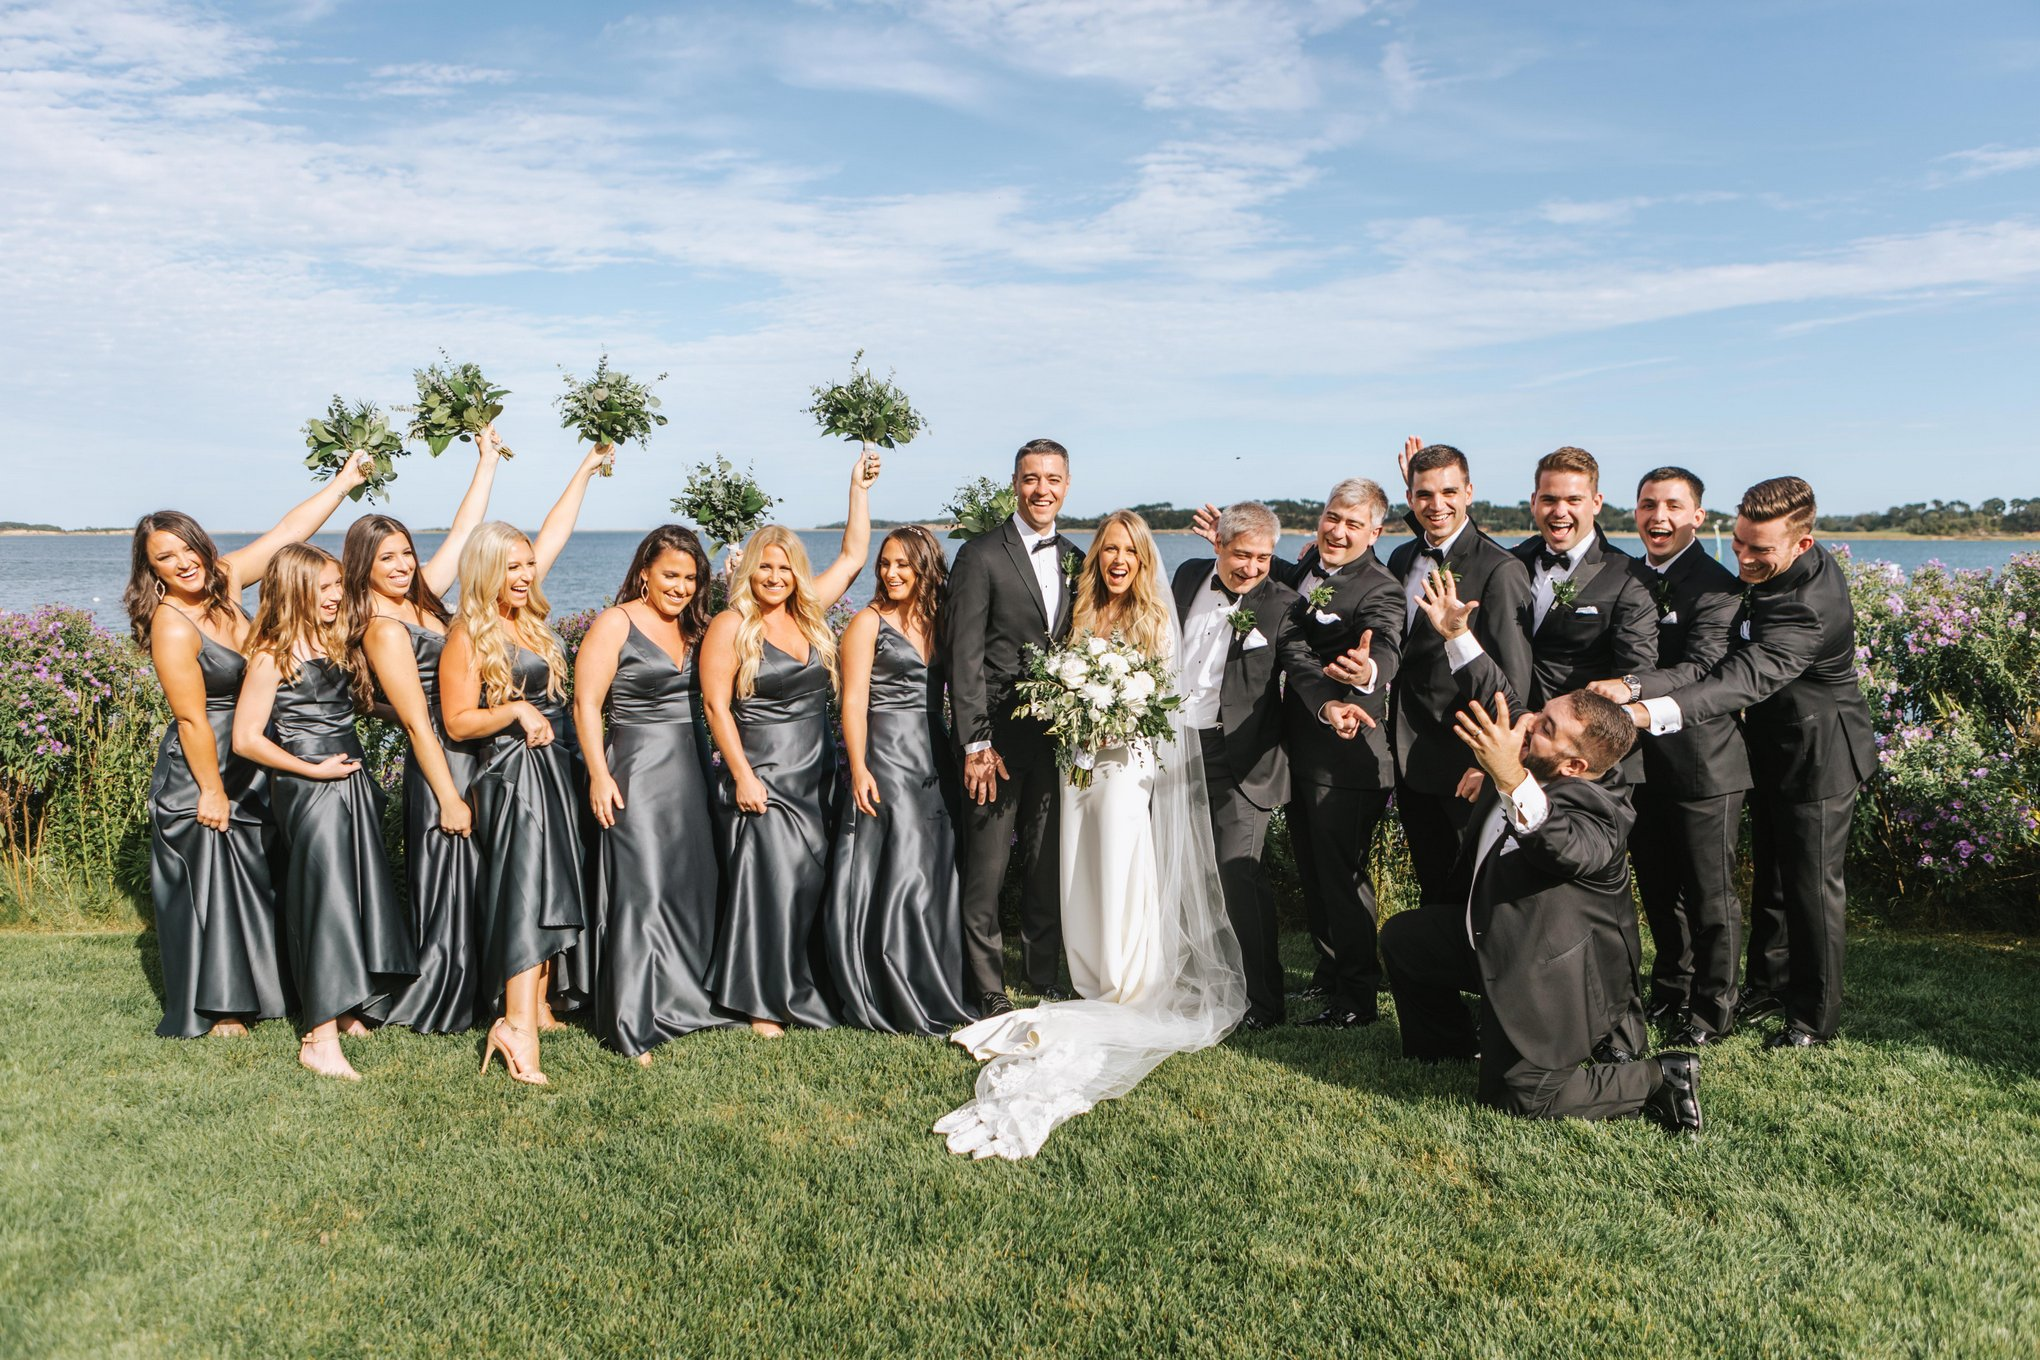 Wequassett-Wedding-Photographer-Cape-Cod-Boston-Lena-Mirisola-20.jpg